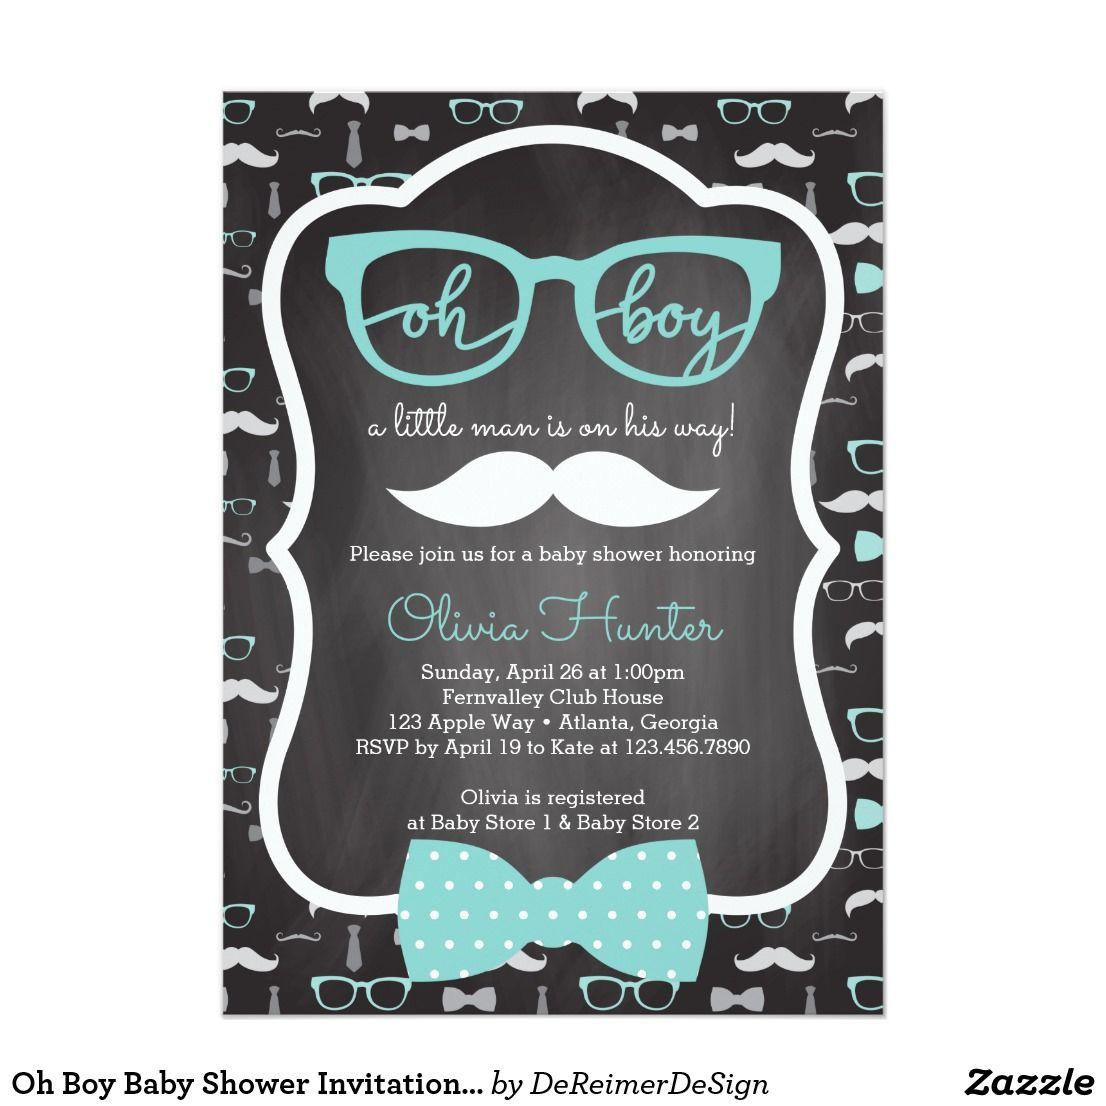 Oh boy baby shower invitation blue gray card baby shower oh boy baby shower invitation blue gray card filmwisefo